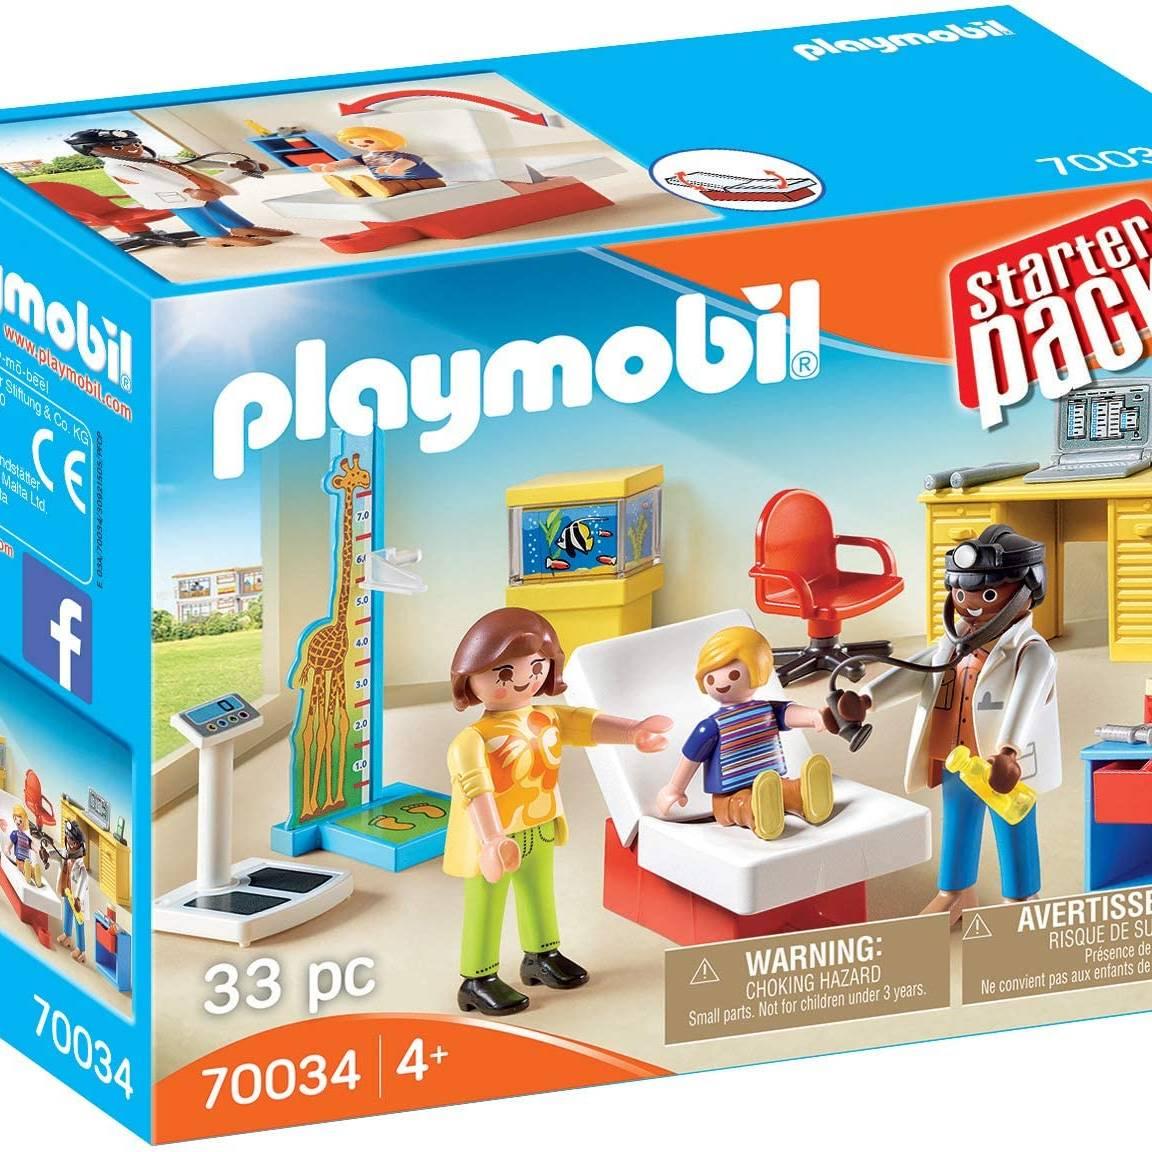 Playmobil 70034 Starter Pack Paediatrician's Office